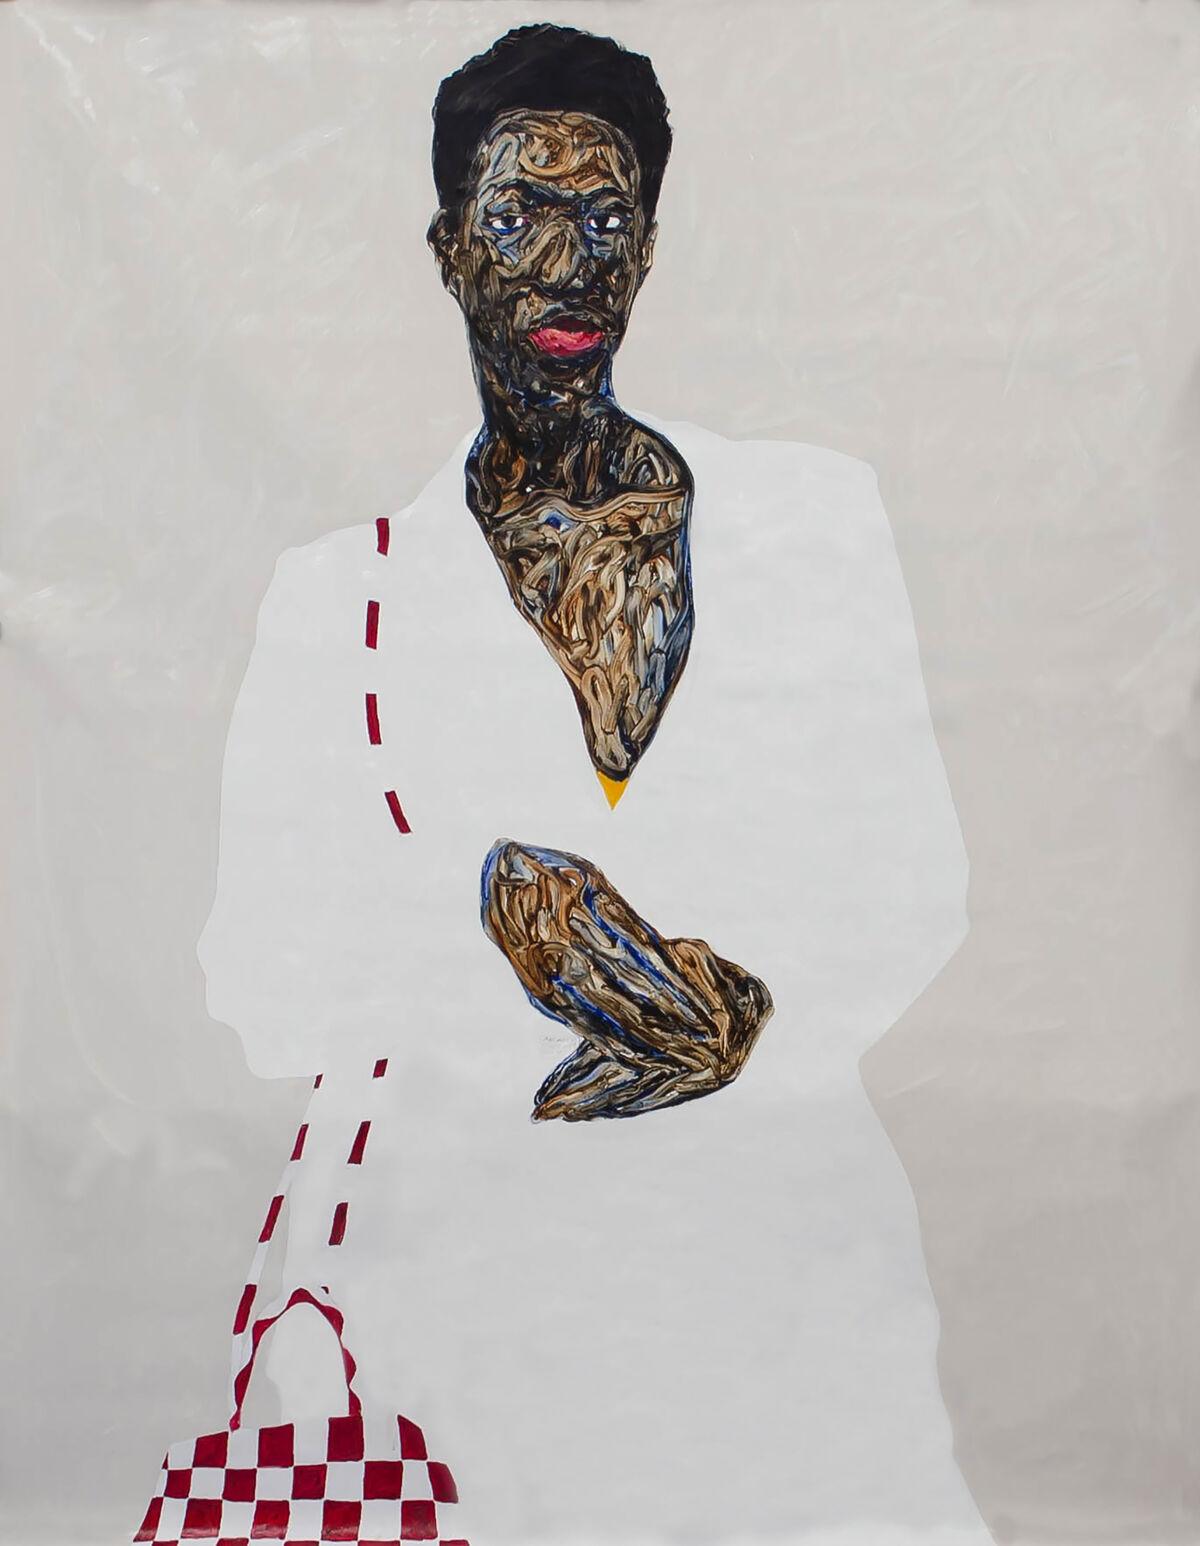 Amoako Boafo, Nerida Cocamaro, 2019. Courtesy of the artist and Mariane Ibrahim.